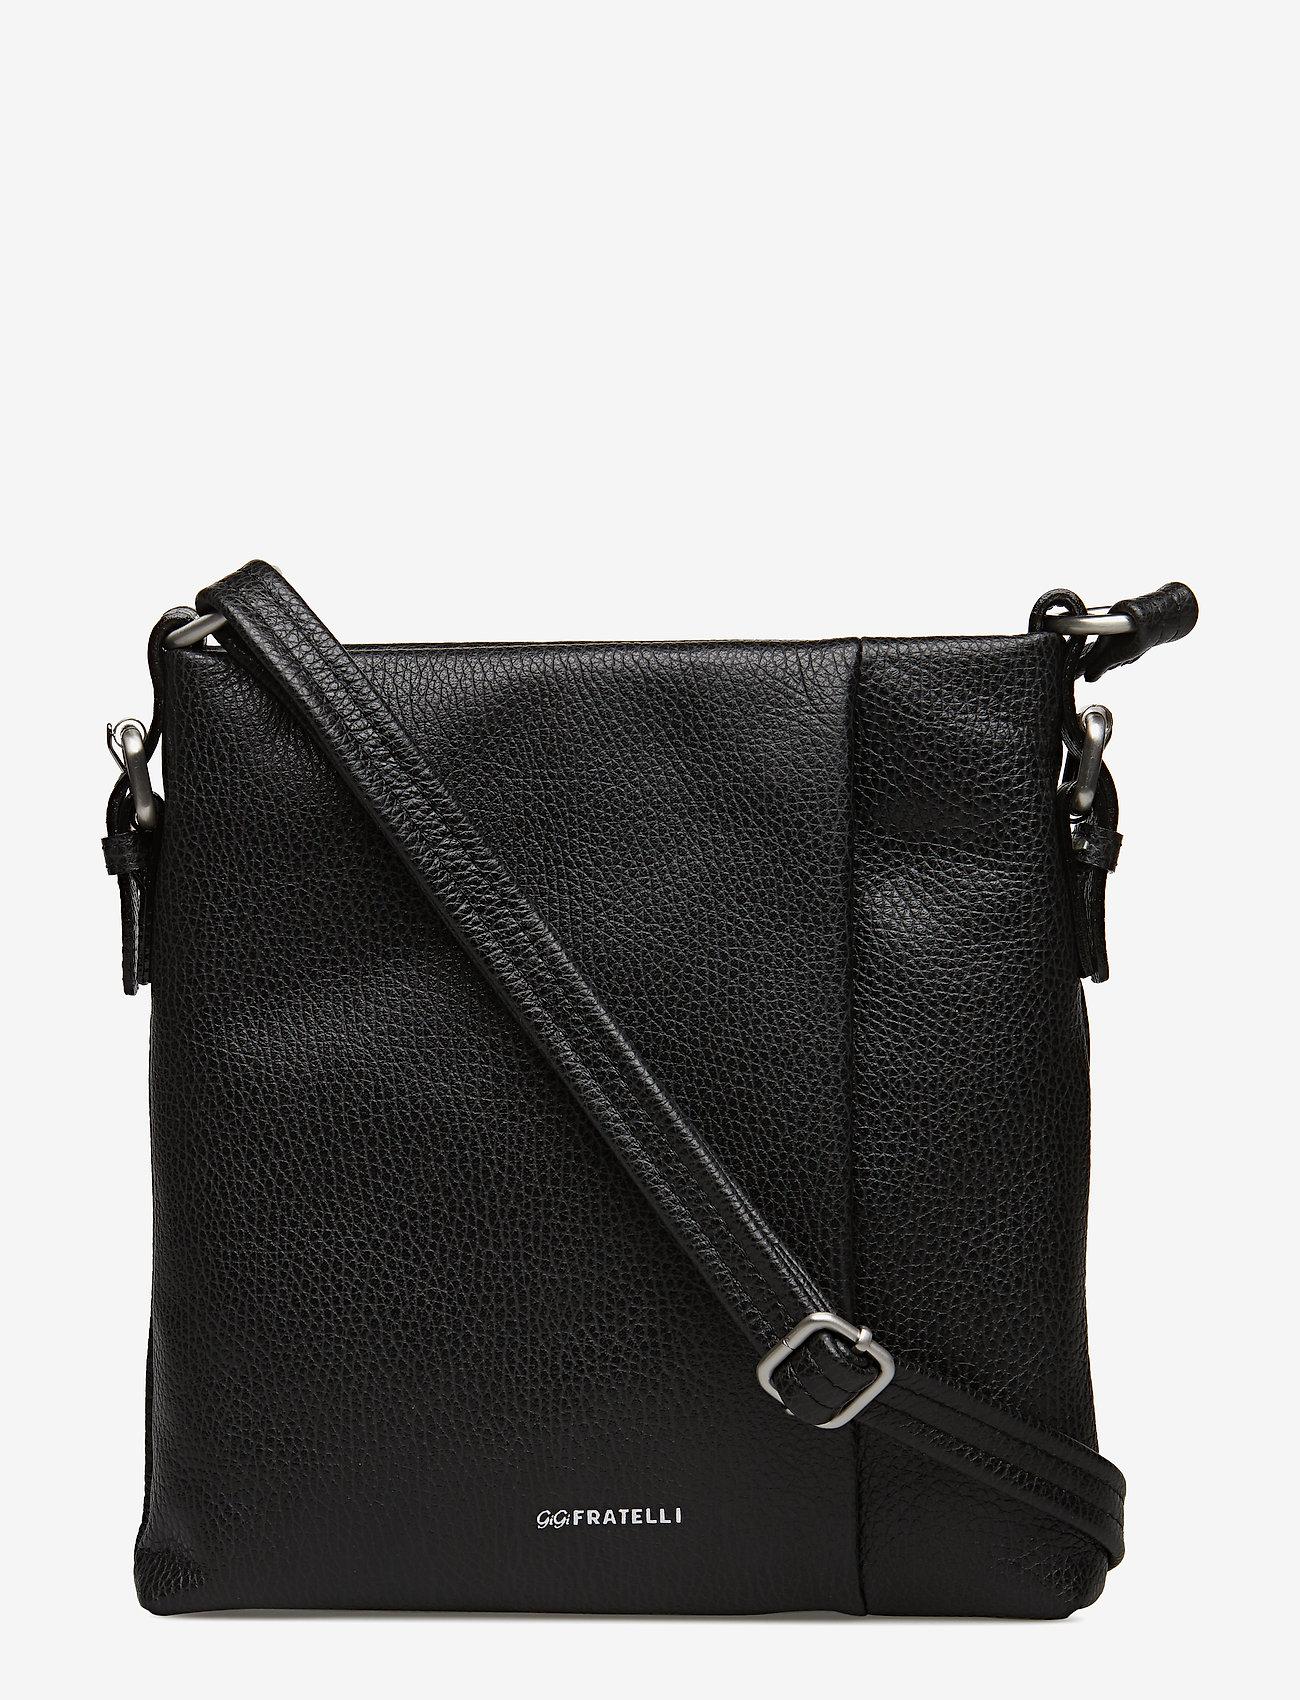 GiGi Fratelli - Romance shoulderbag / crossbody bag - schoudertassen - black